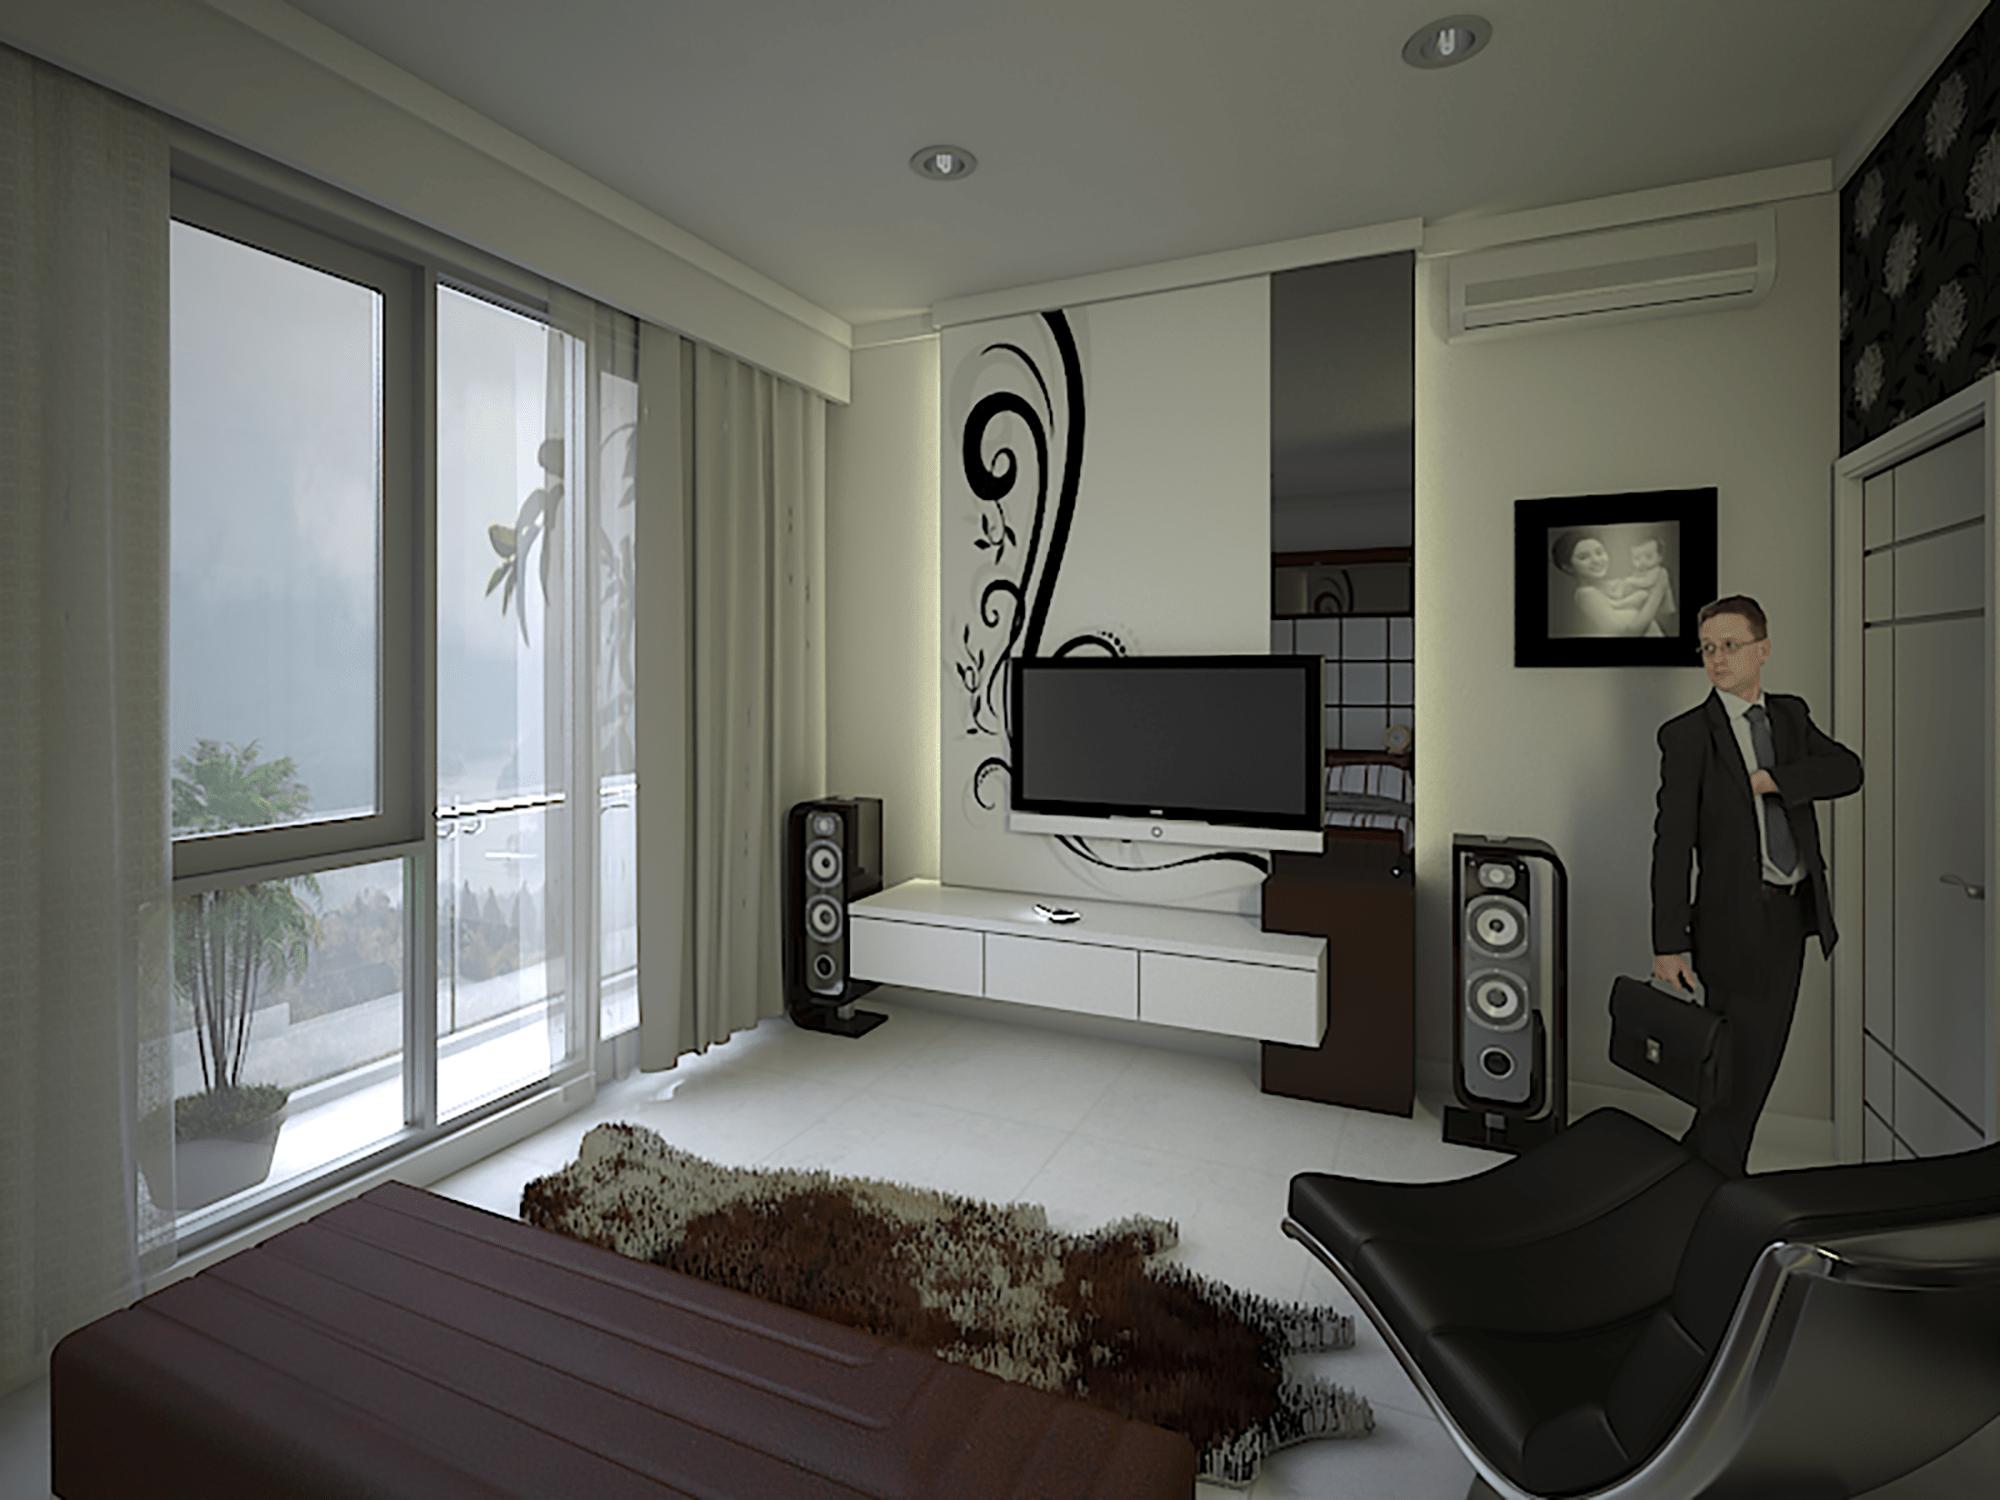 gambar arsitektur interior desain backdrop tv kamar tidur utama